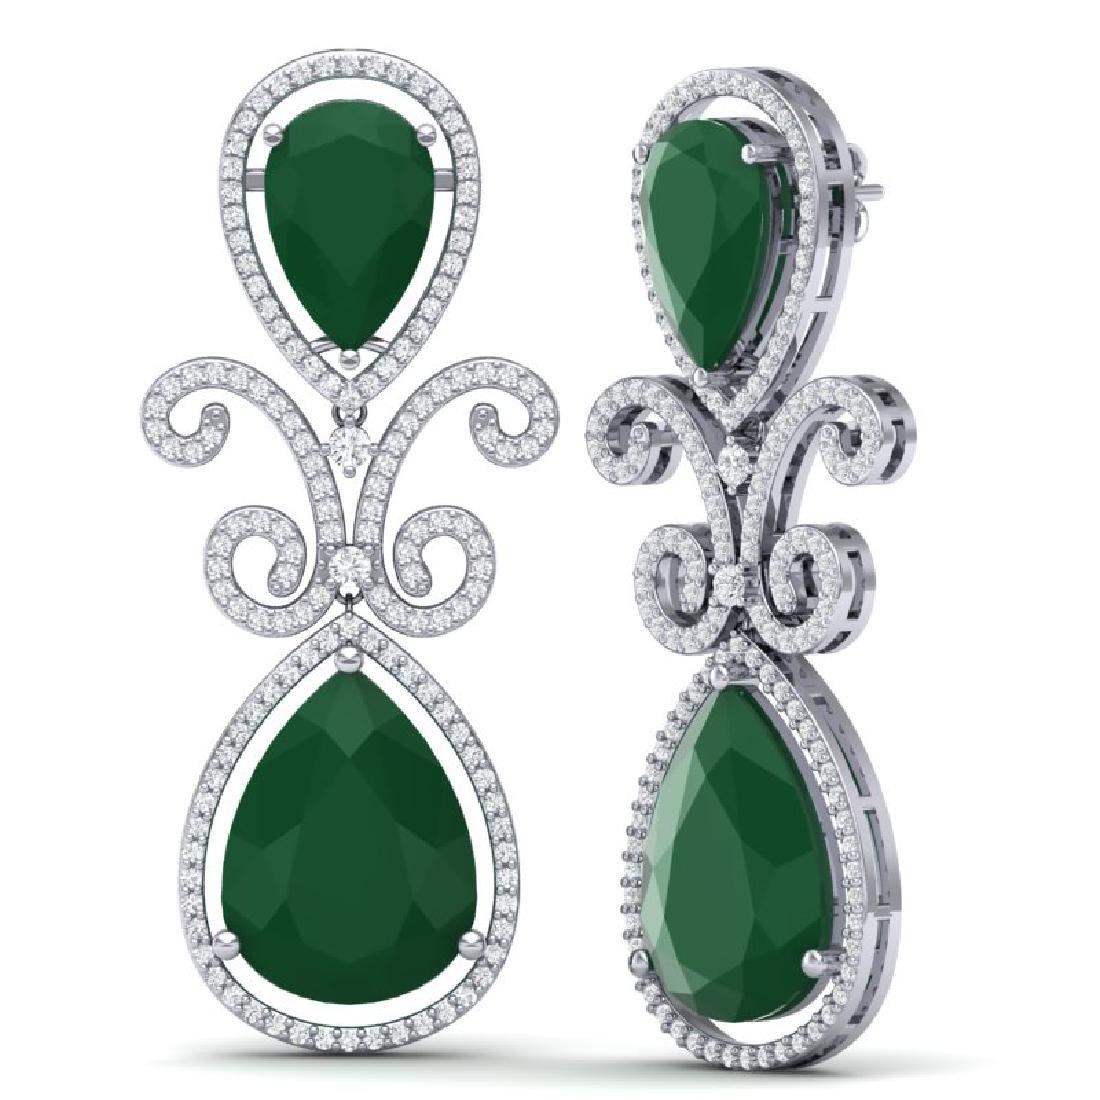 31.6 CTW Royalty Emerald & VS Diamond Earrings 18K - 3